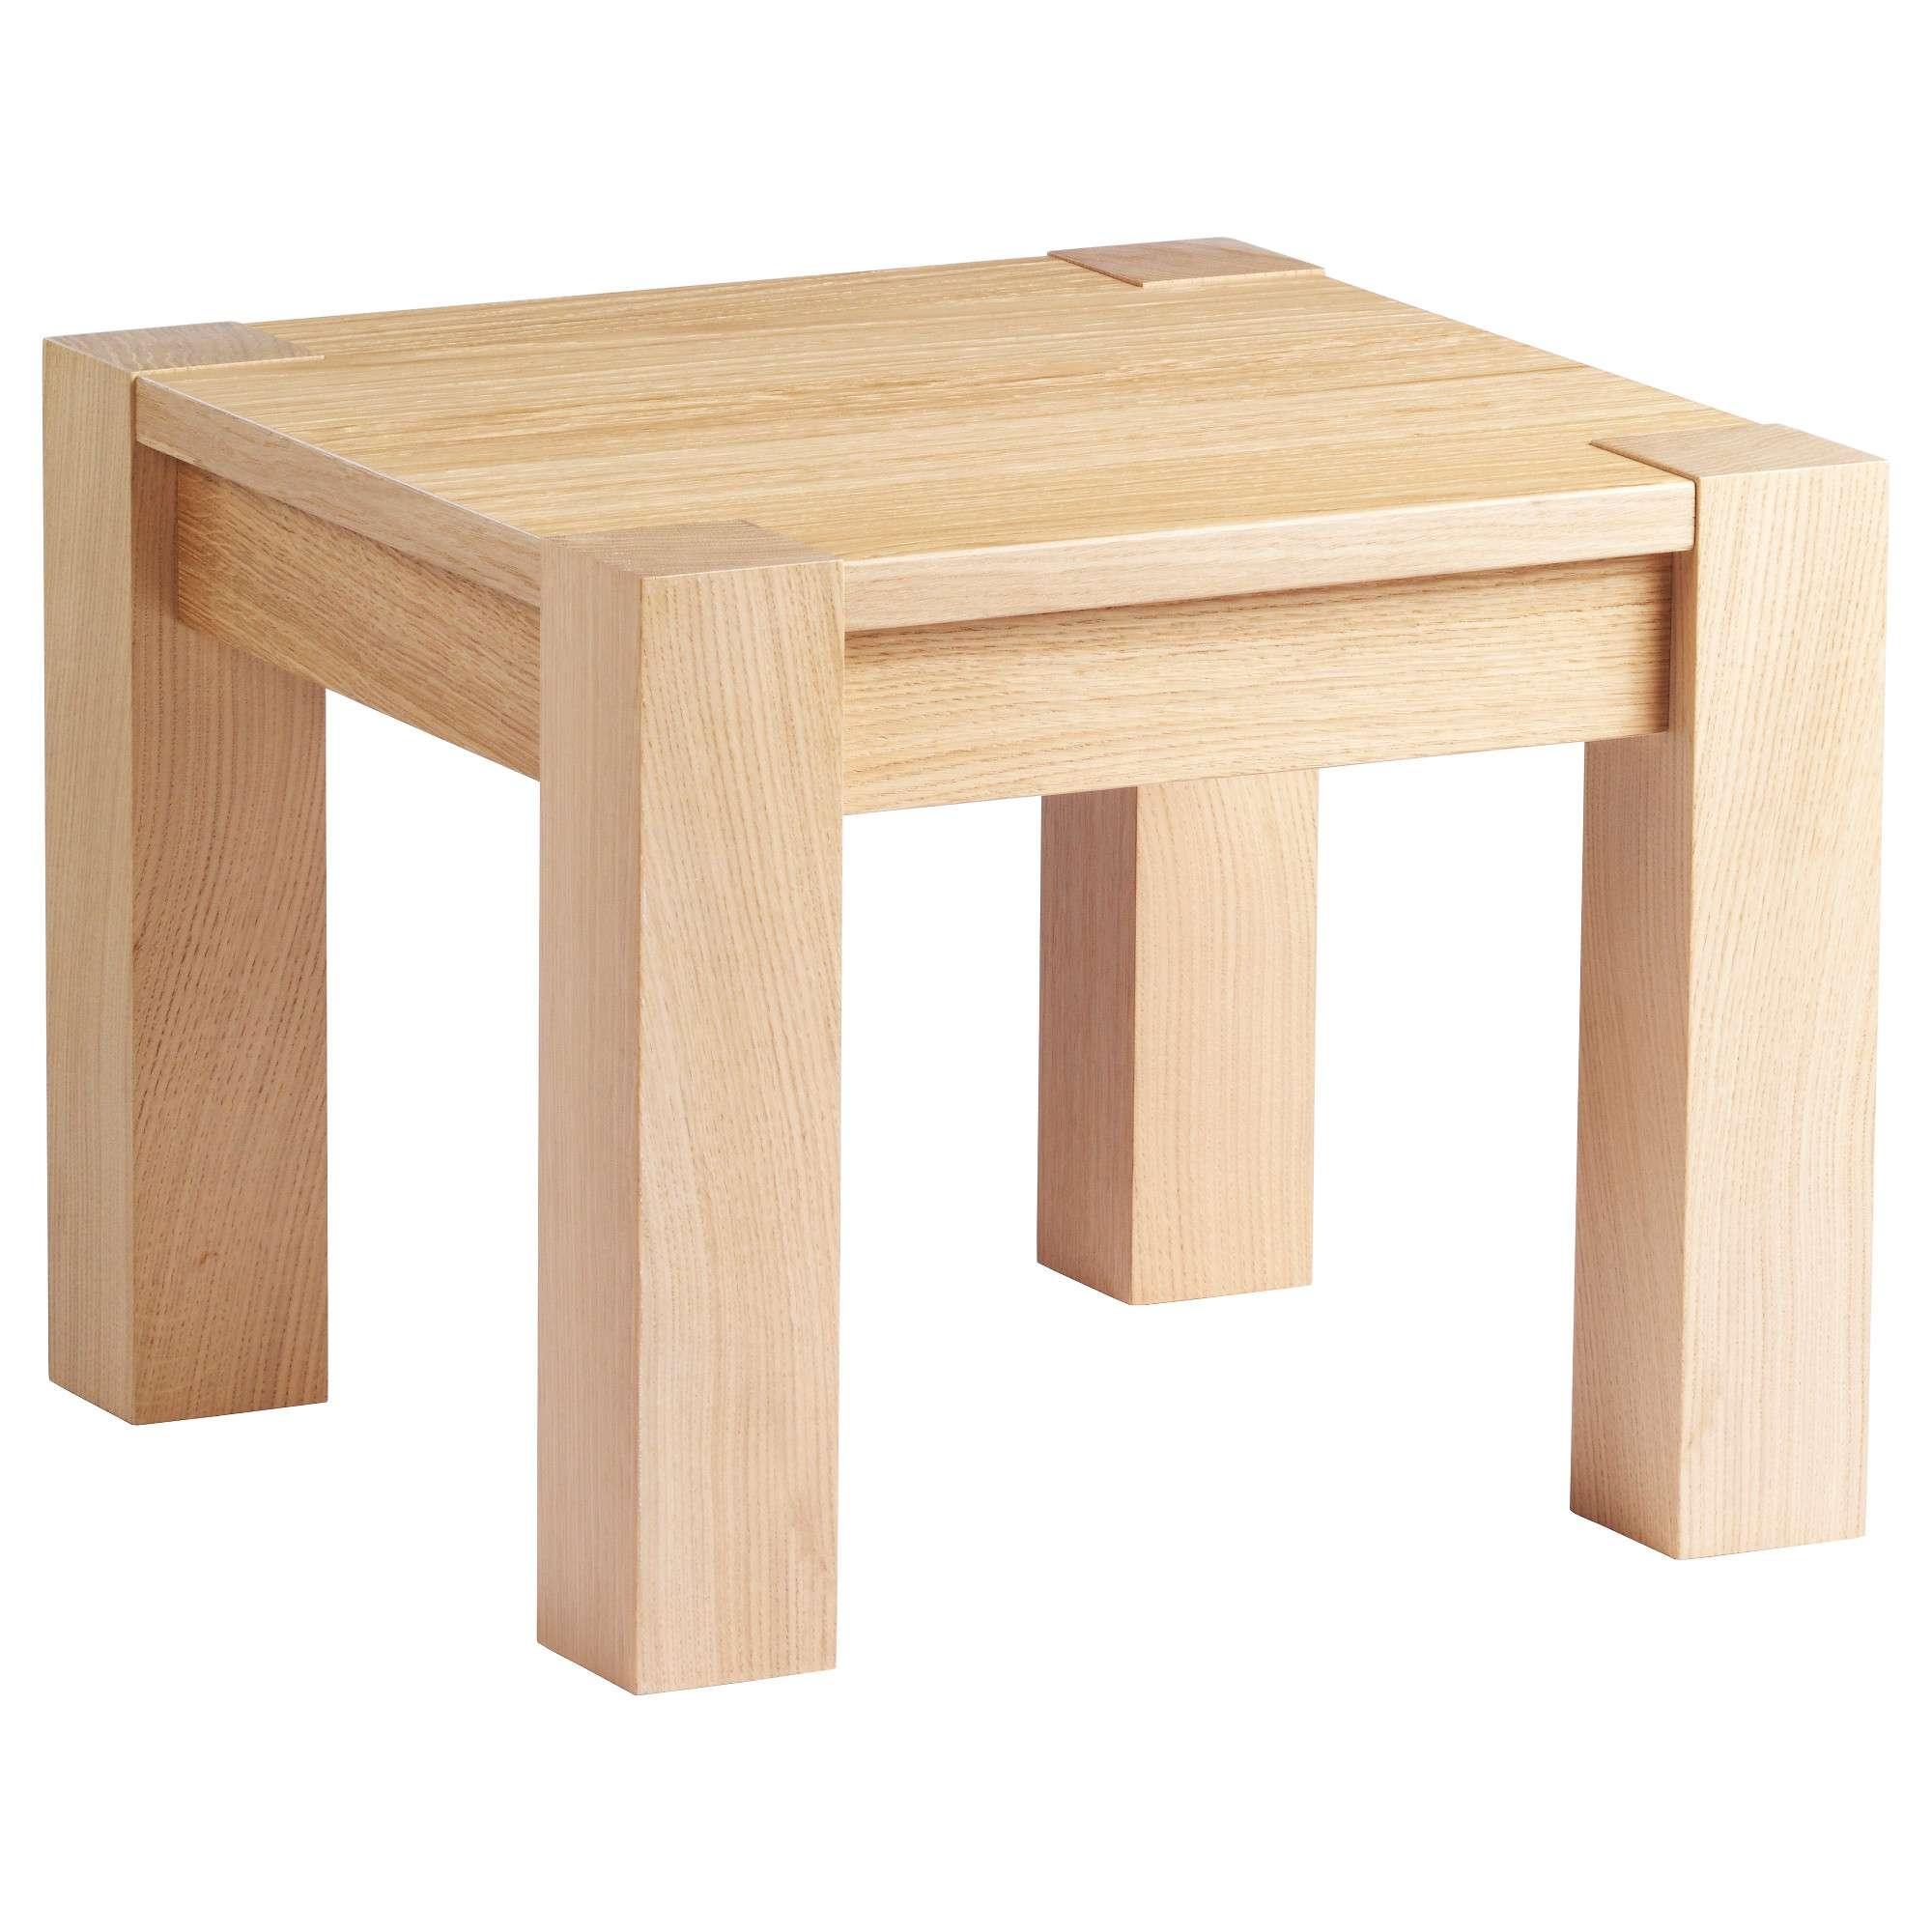 Most Popular Oak Veneer Coffee Tables With Regard To Högsby Coffee Table Oak Veneer 50x50 Cm – Ikea (View 3 of 20)